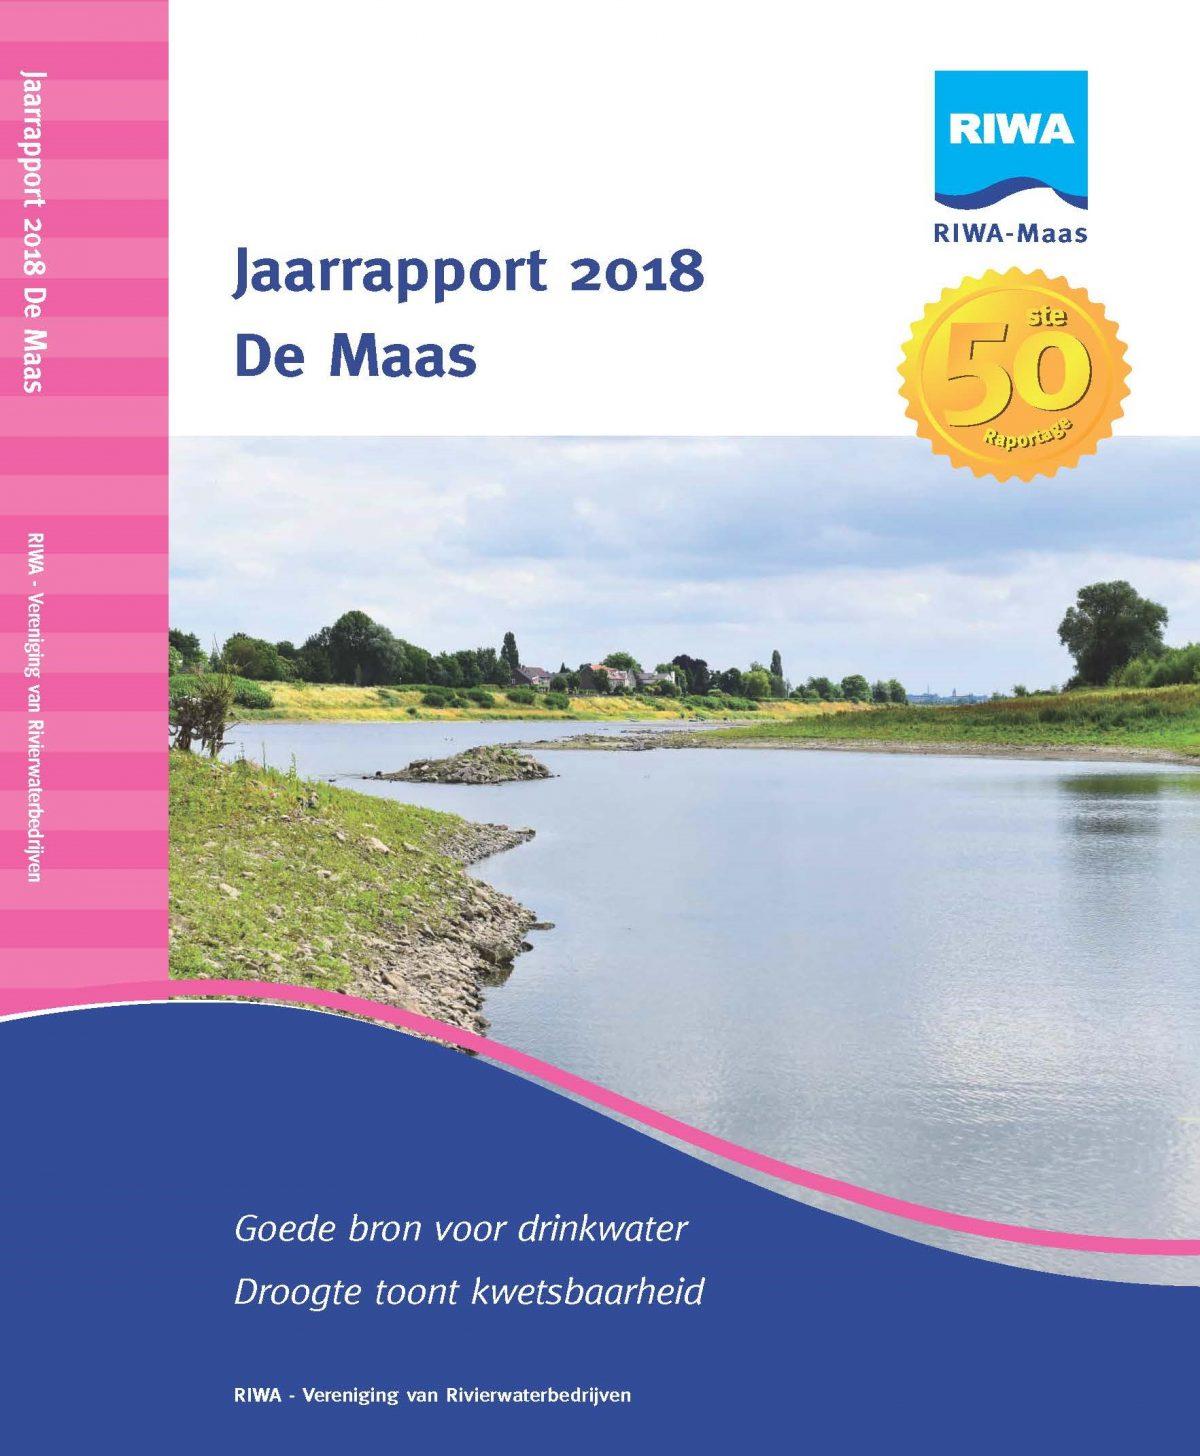 RIWA Jaarrapport 2018 De Maas